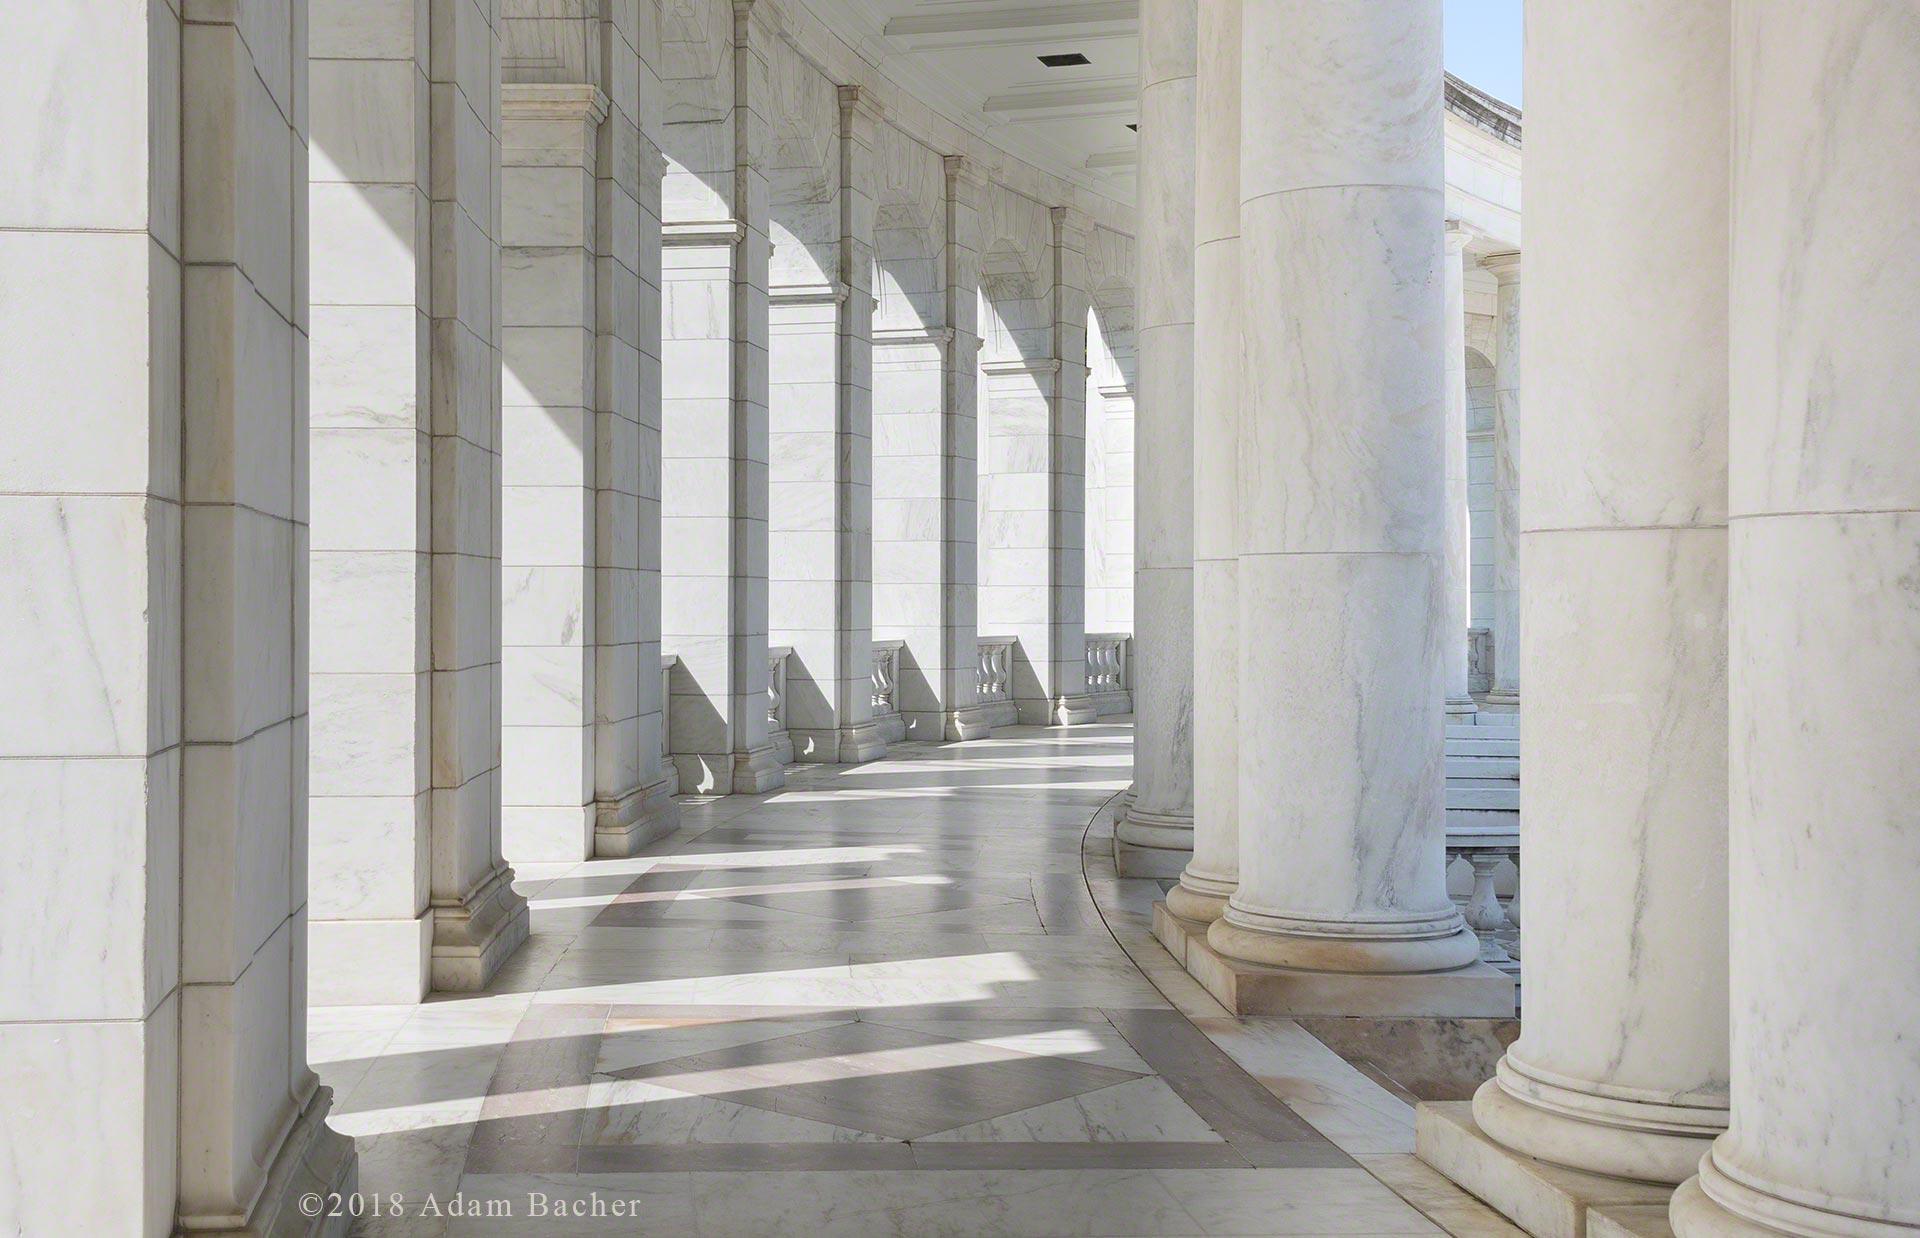 Arlington national cemetery, Washington DC. marble pillars